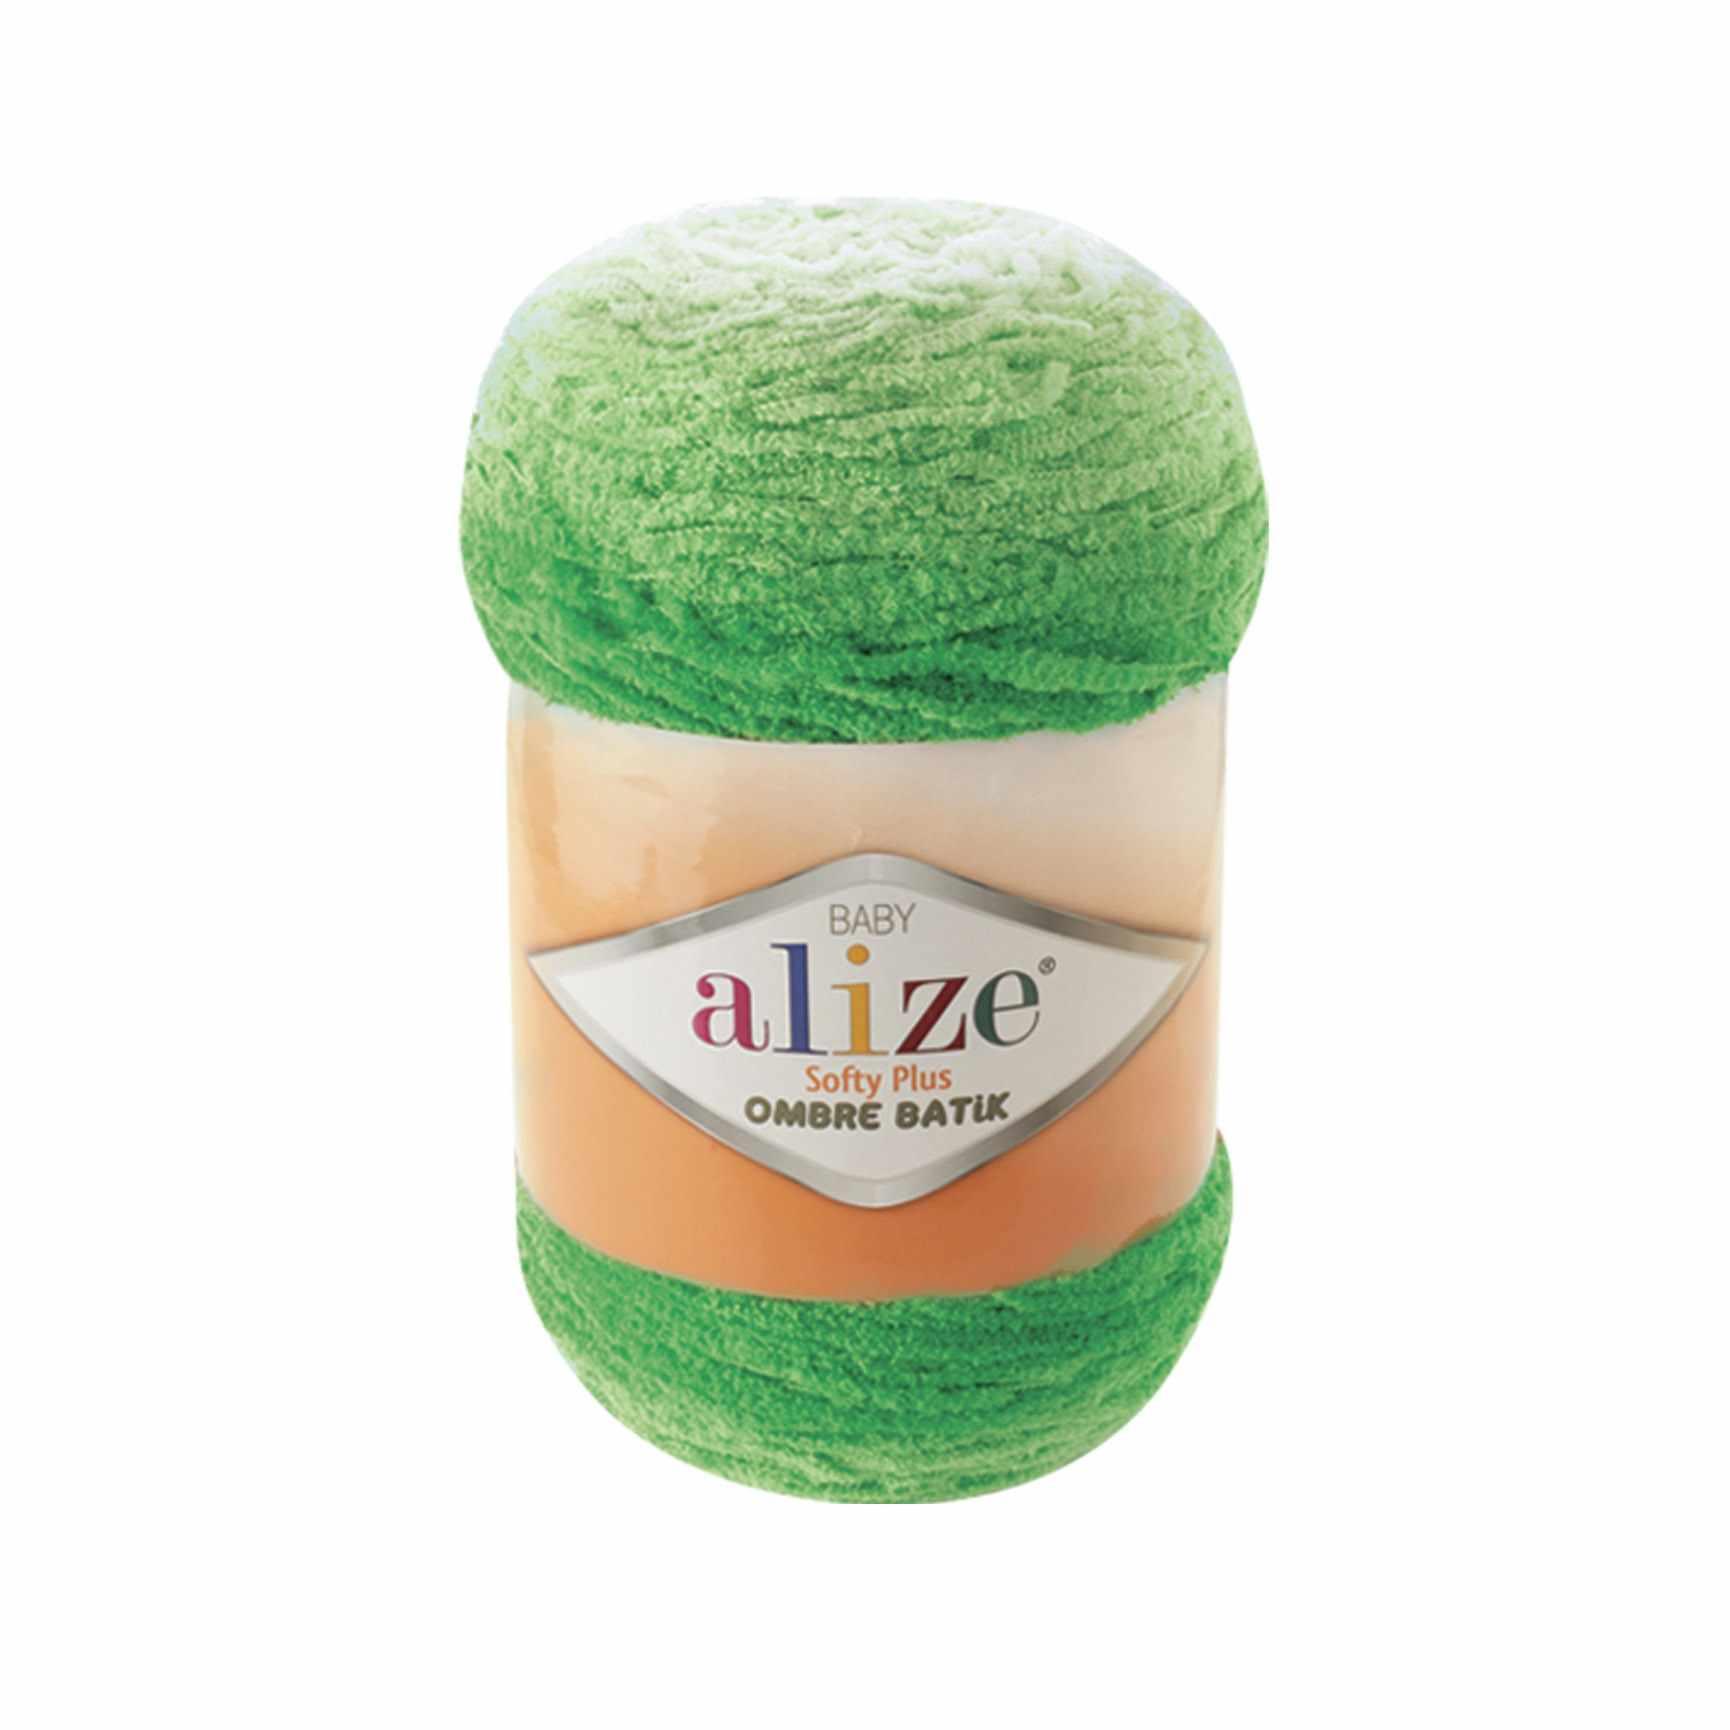 Пряжа Alize Softy Plus Ombre Batik Цвет.7287